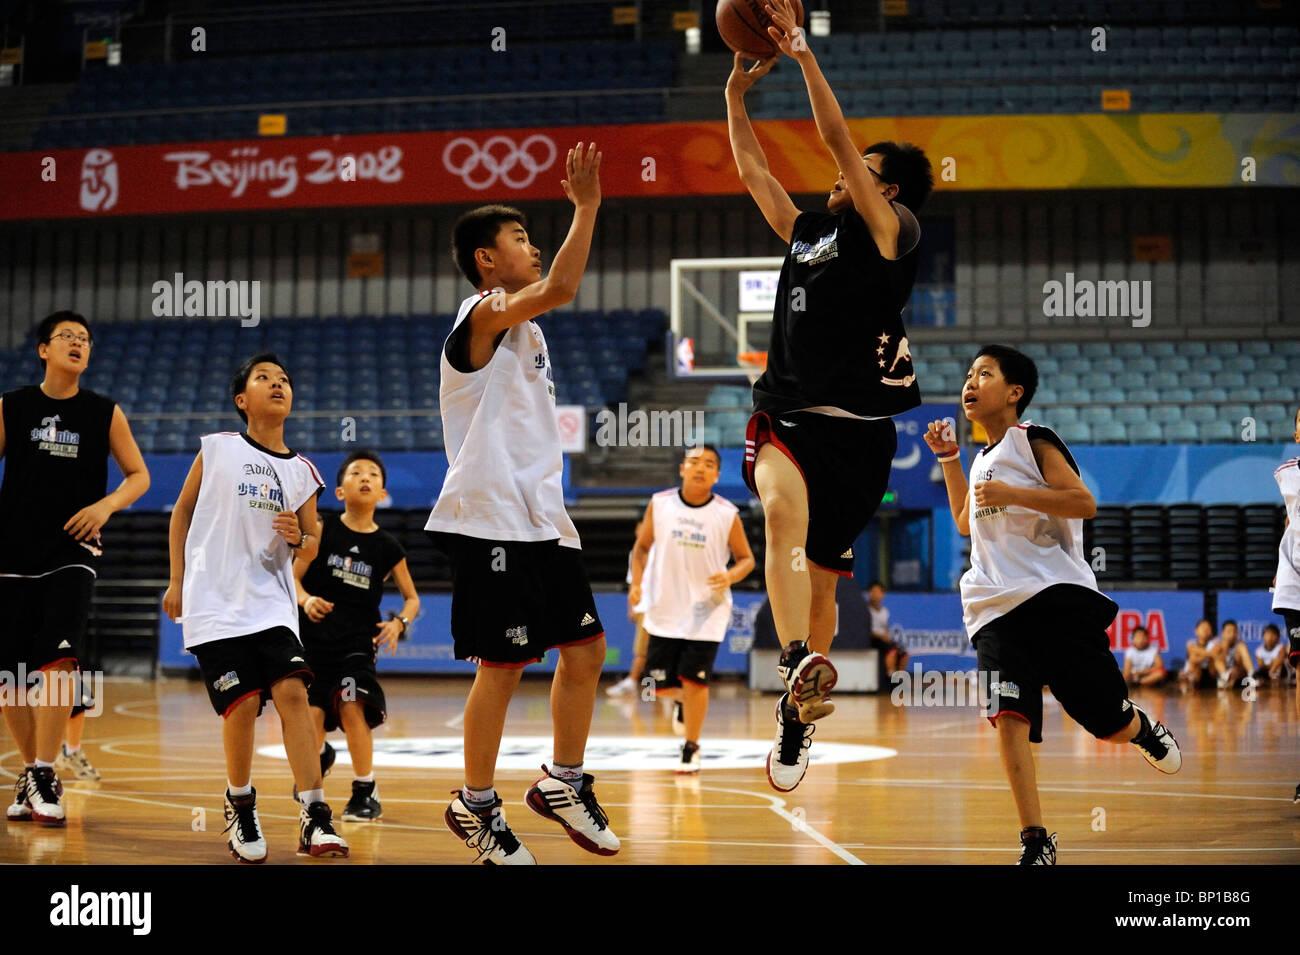 Chinese children play basketball in Beijing, China. - Stock Image